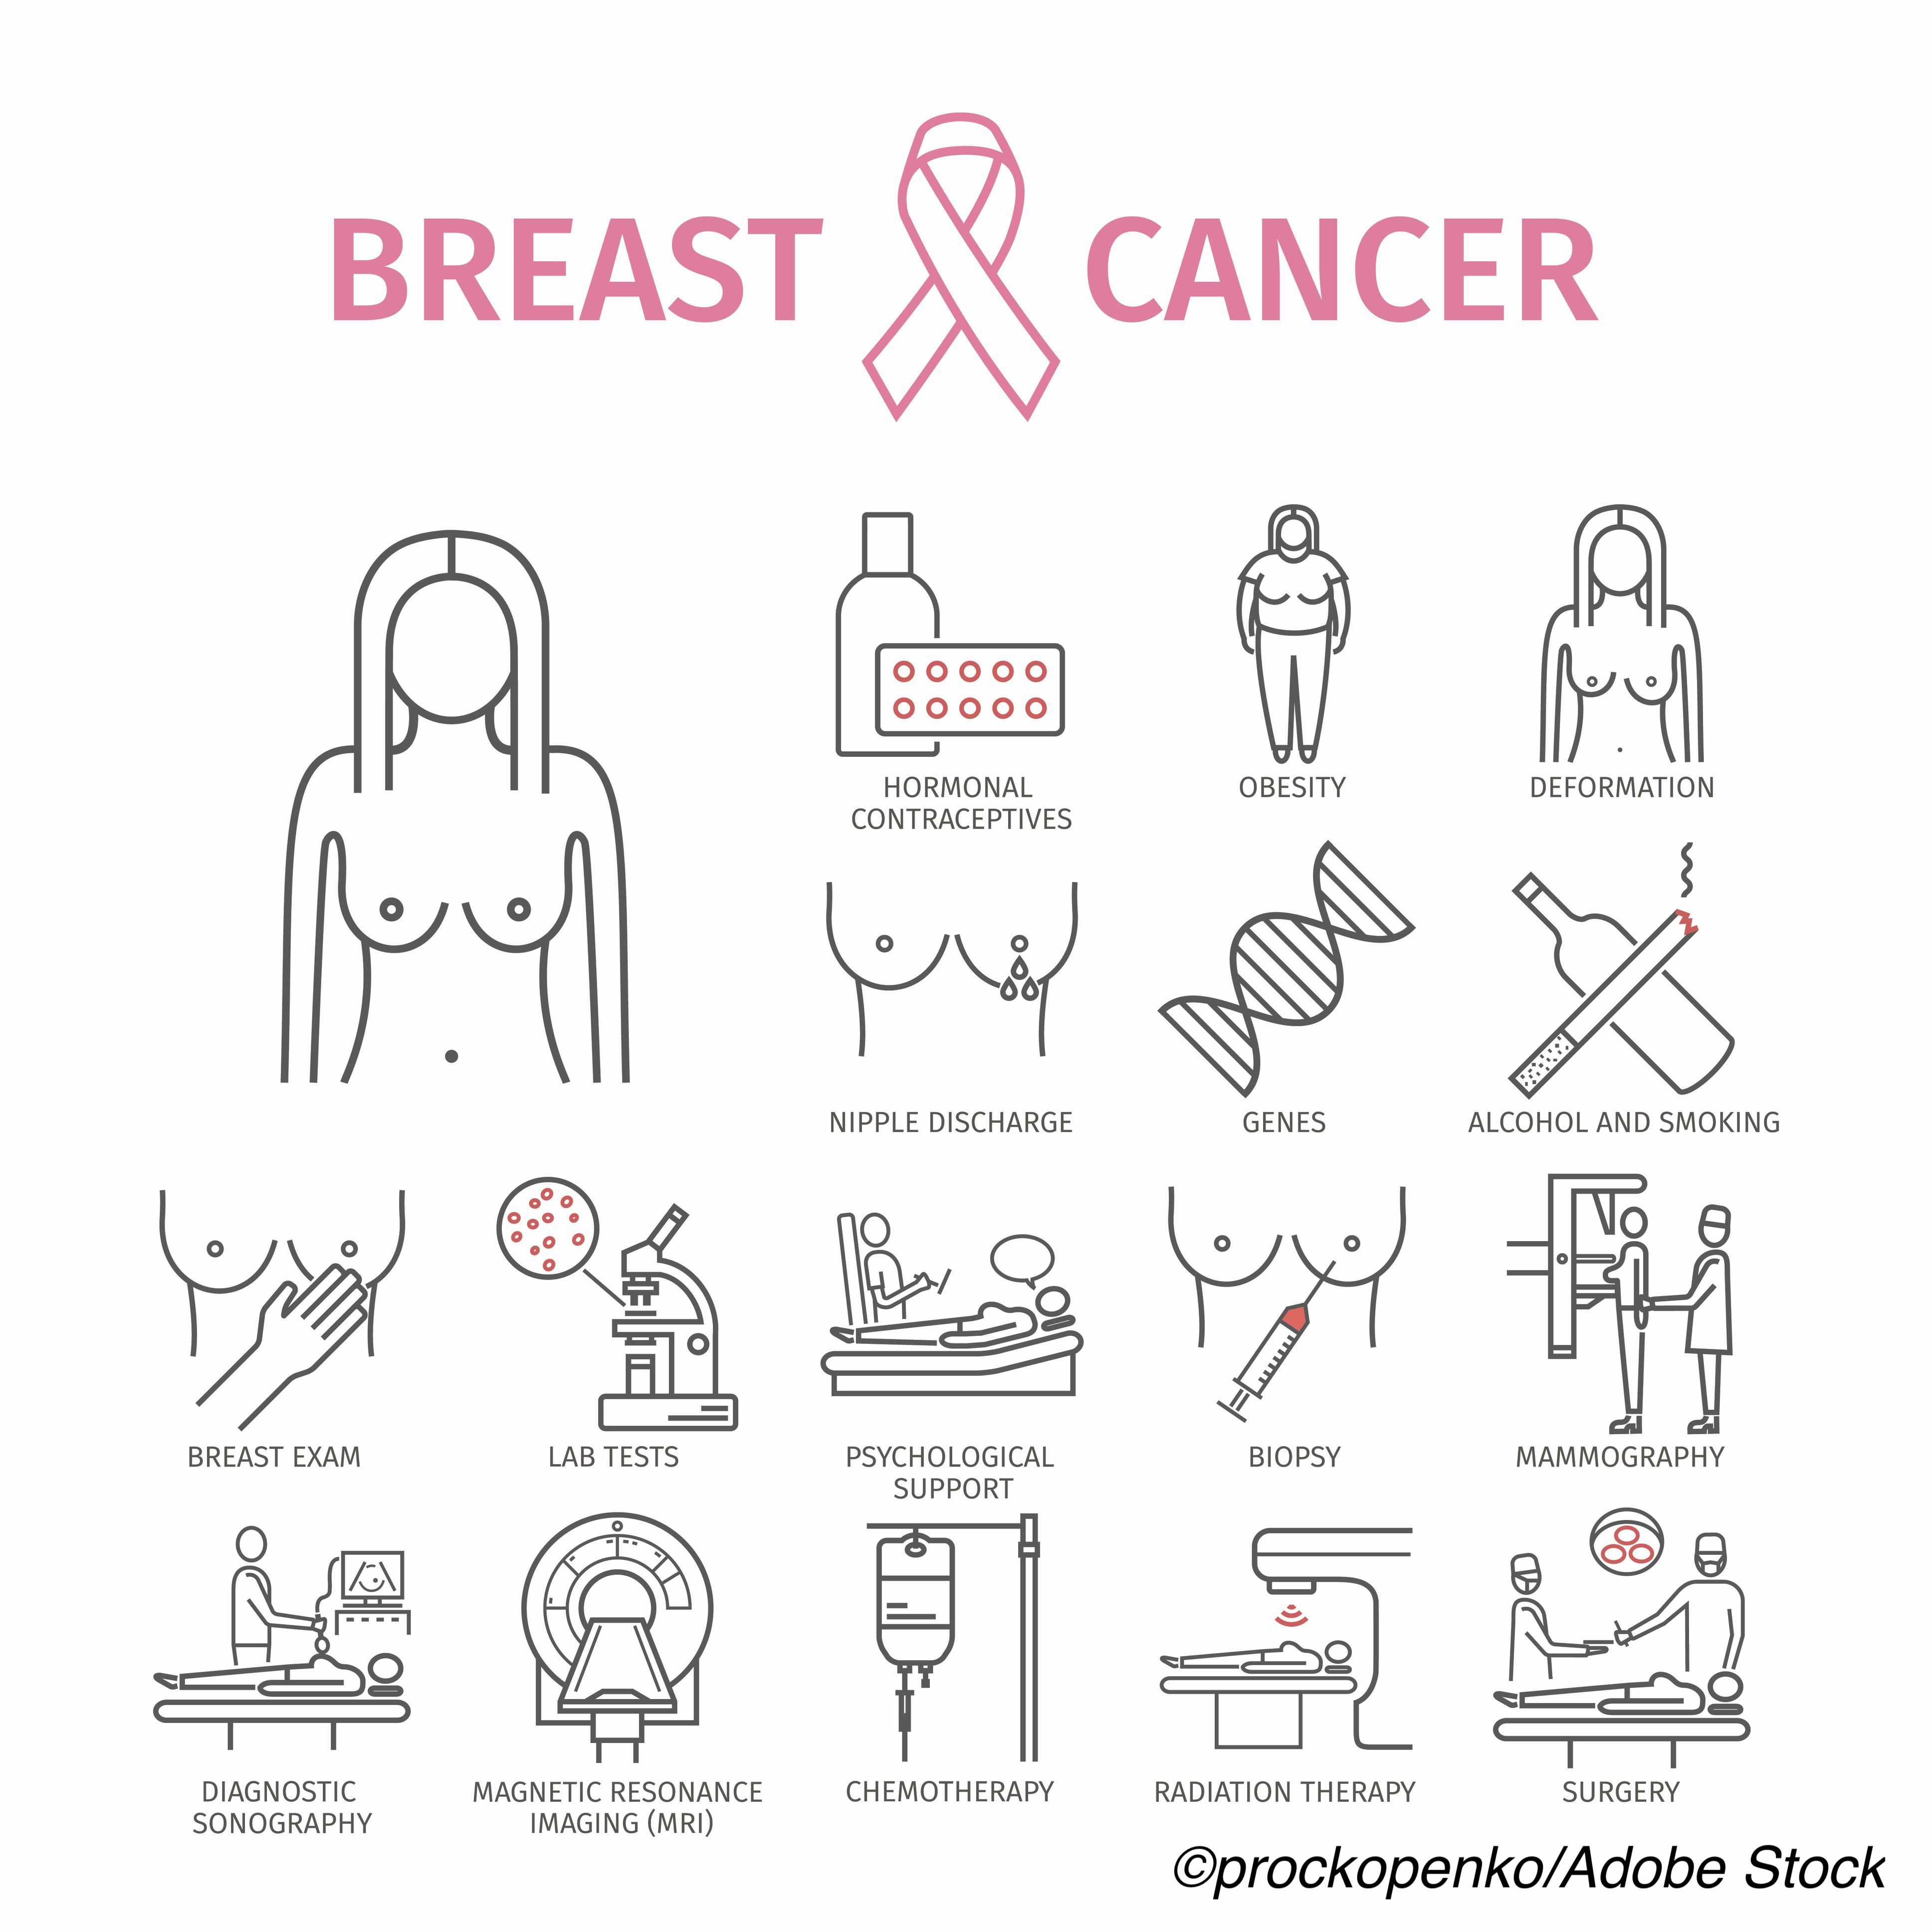 U.S./U.K. Researchers Agree On 8 Genes/Variants That Increase Breast Cancer Risks